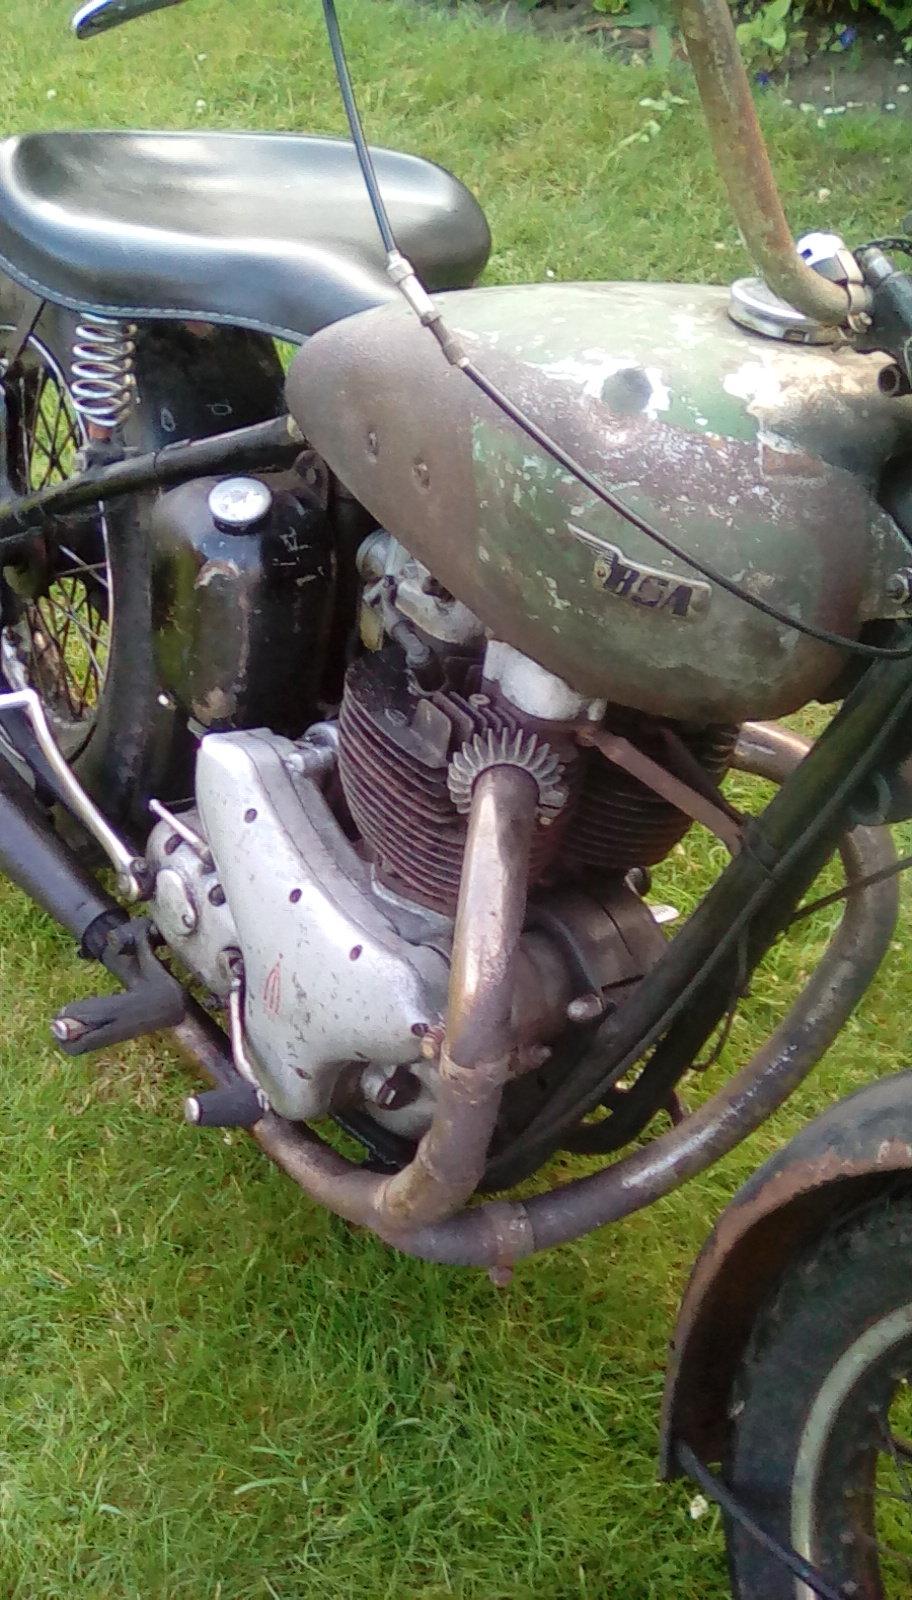 1954 Bsa rat bobber For Sale (picture 4 of 6)